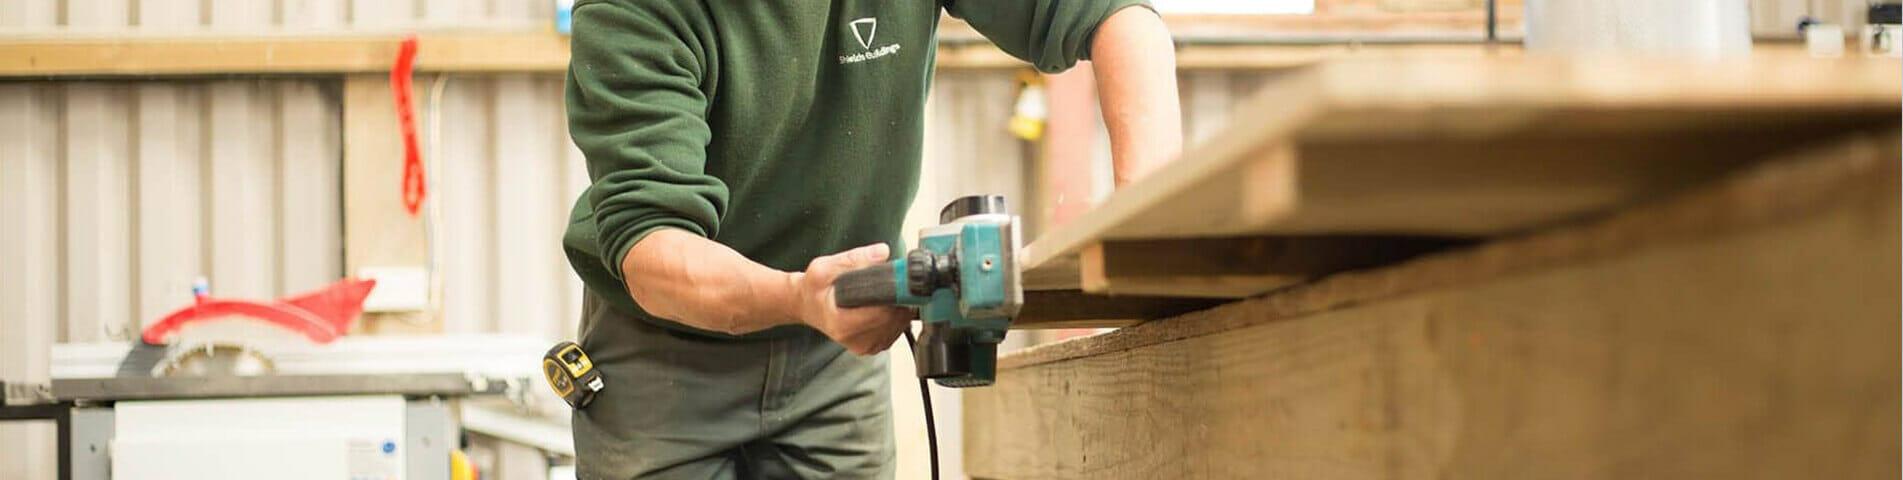 Preparing wood